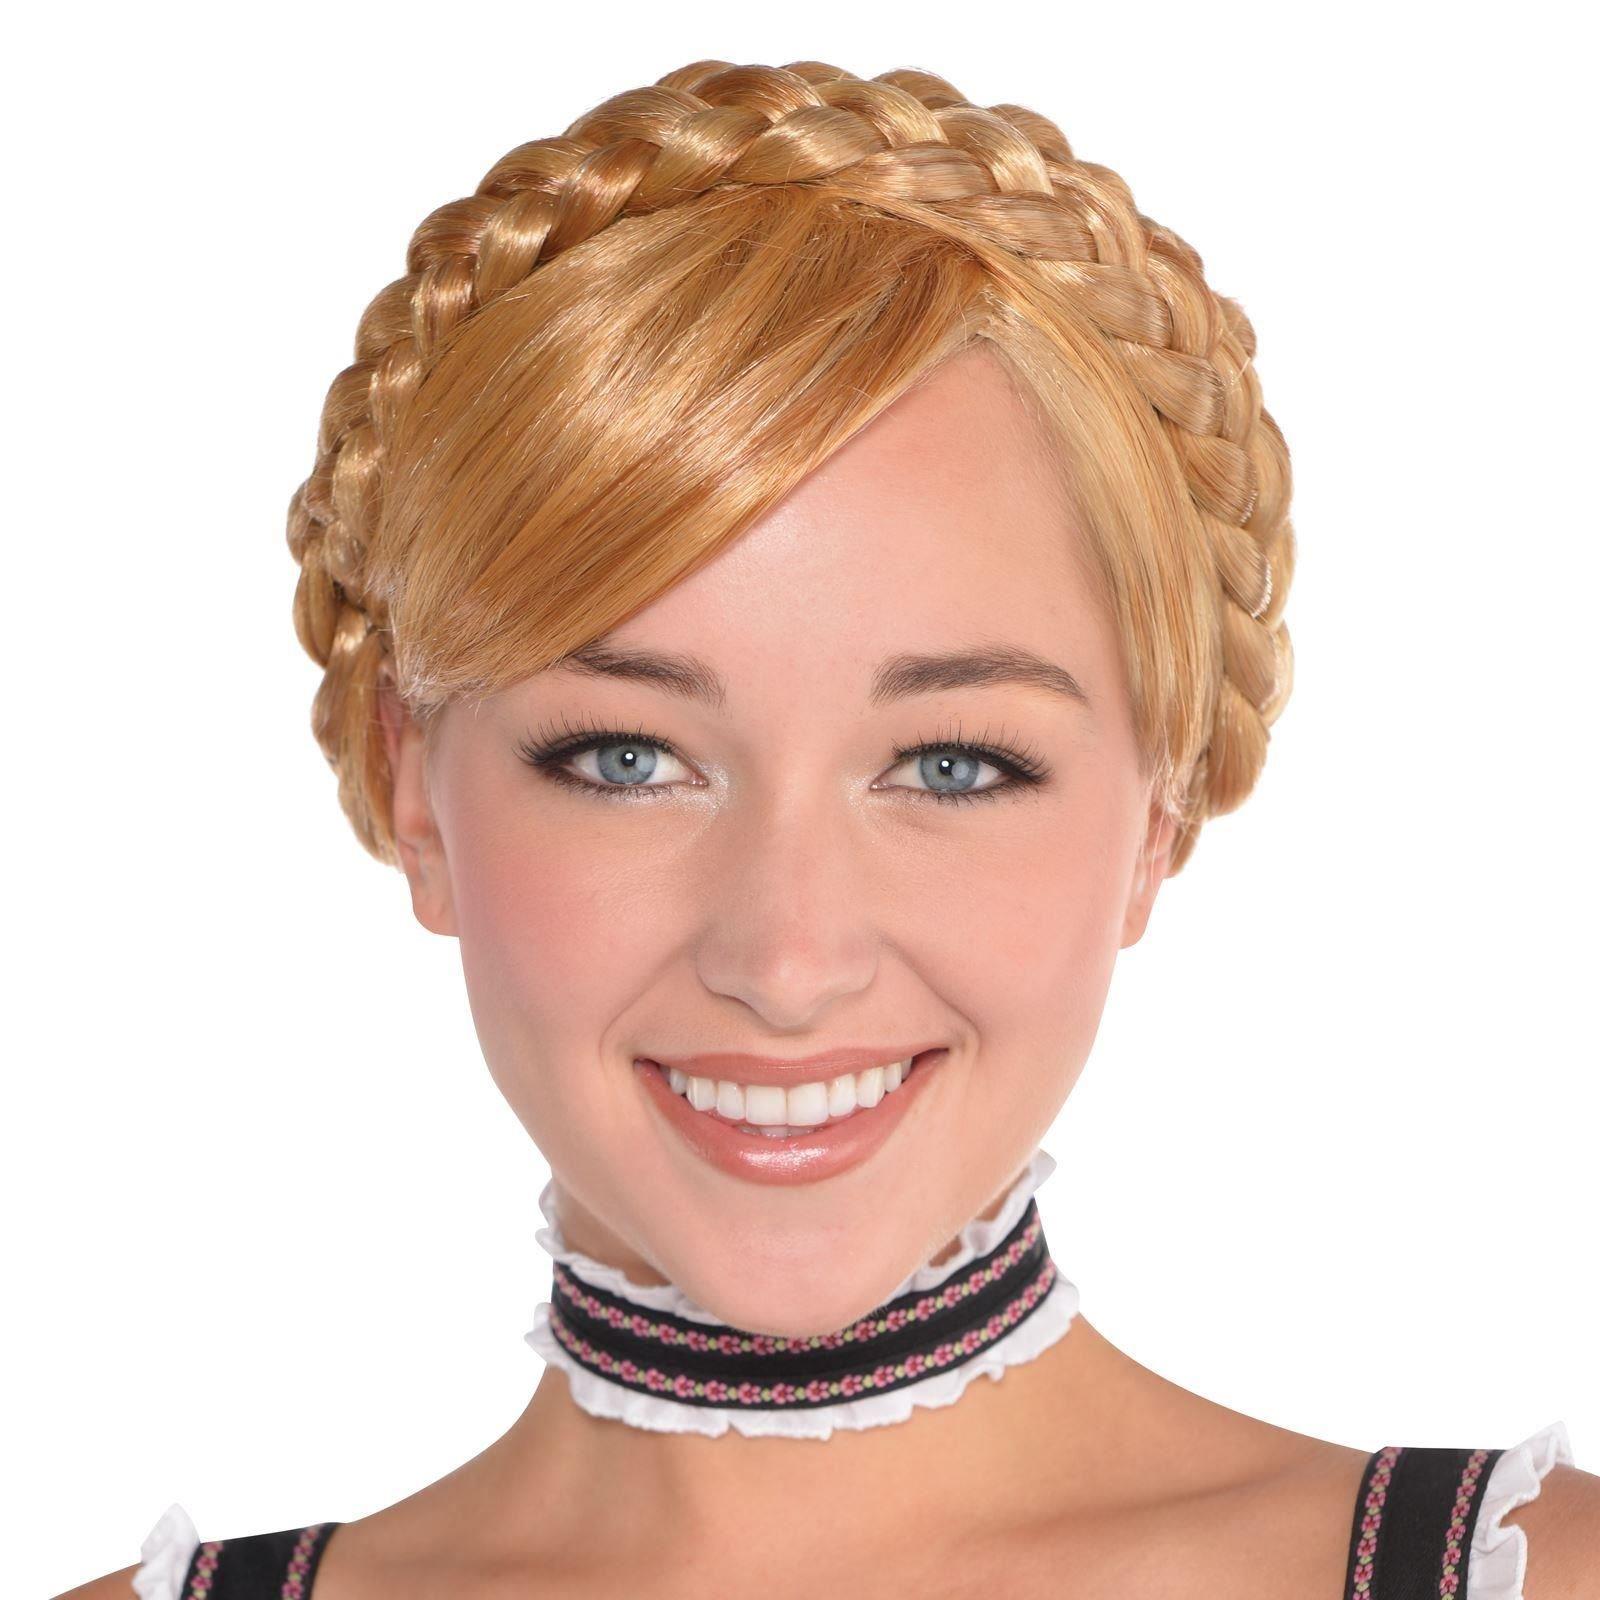 Ladies Blonde Pigtail Wig Heidi Oktoberfest Plaited Wig Fancy Dress Accessory